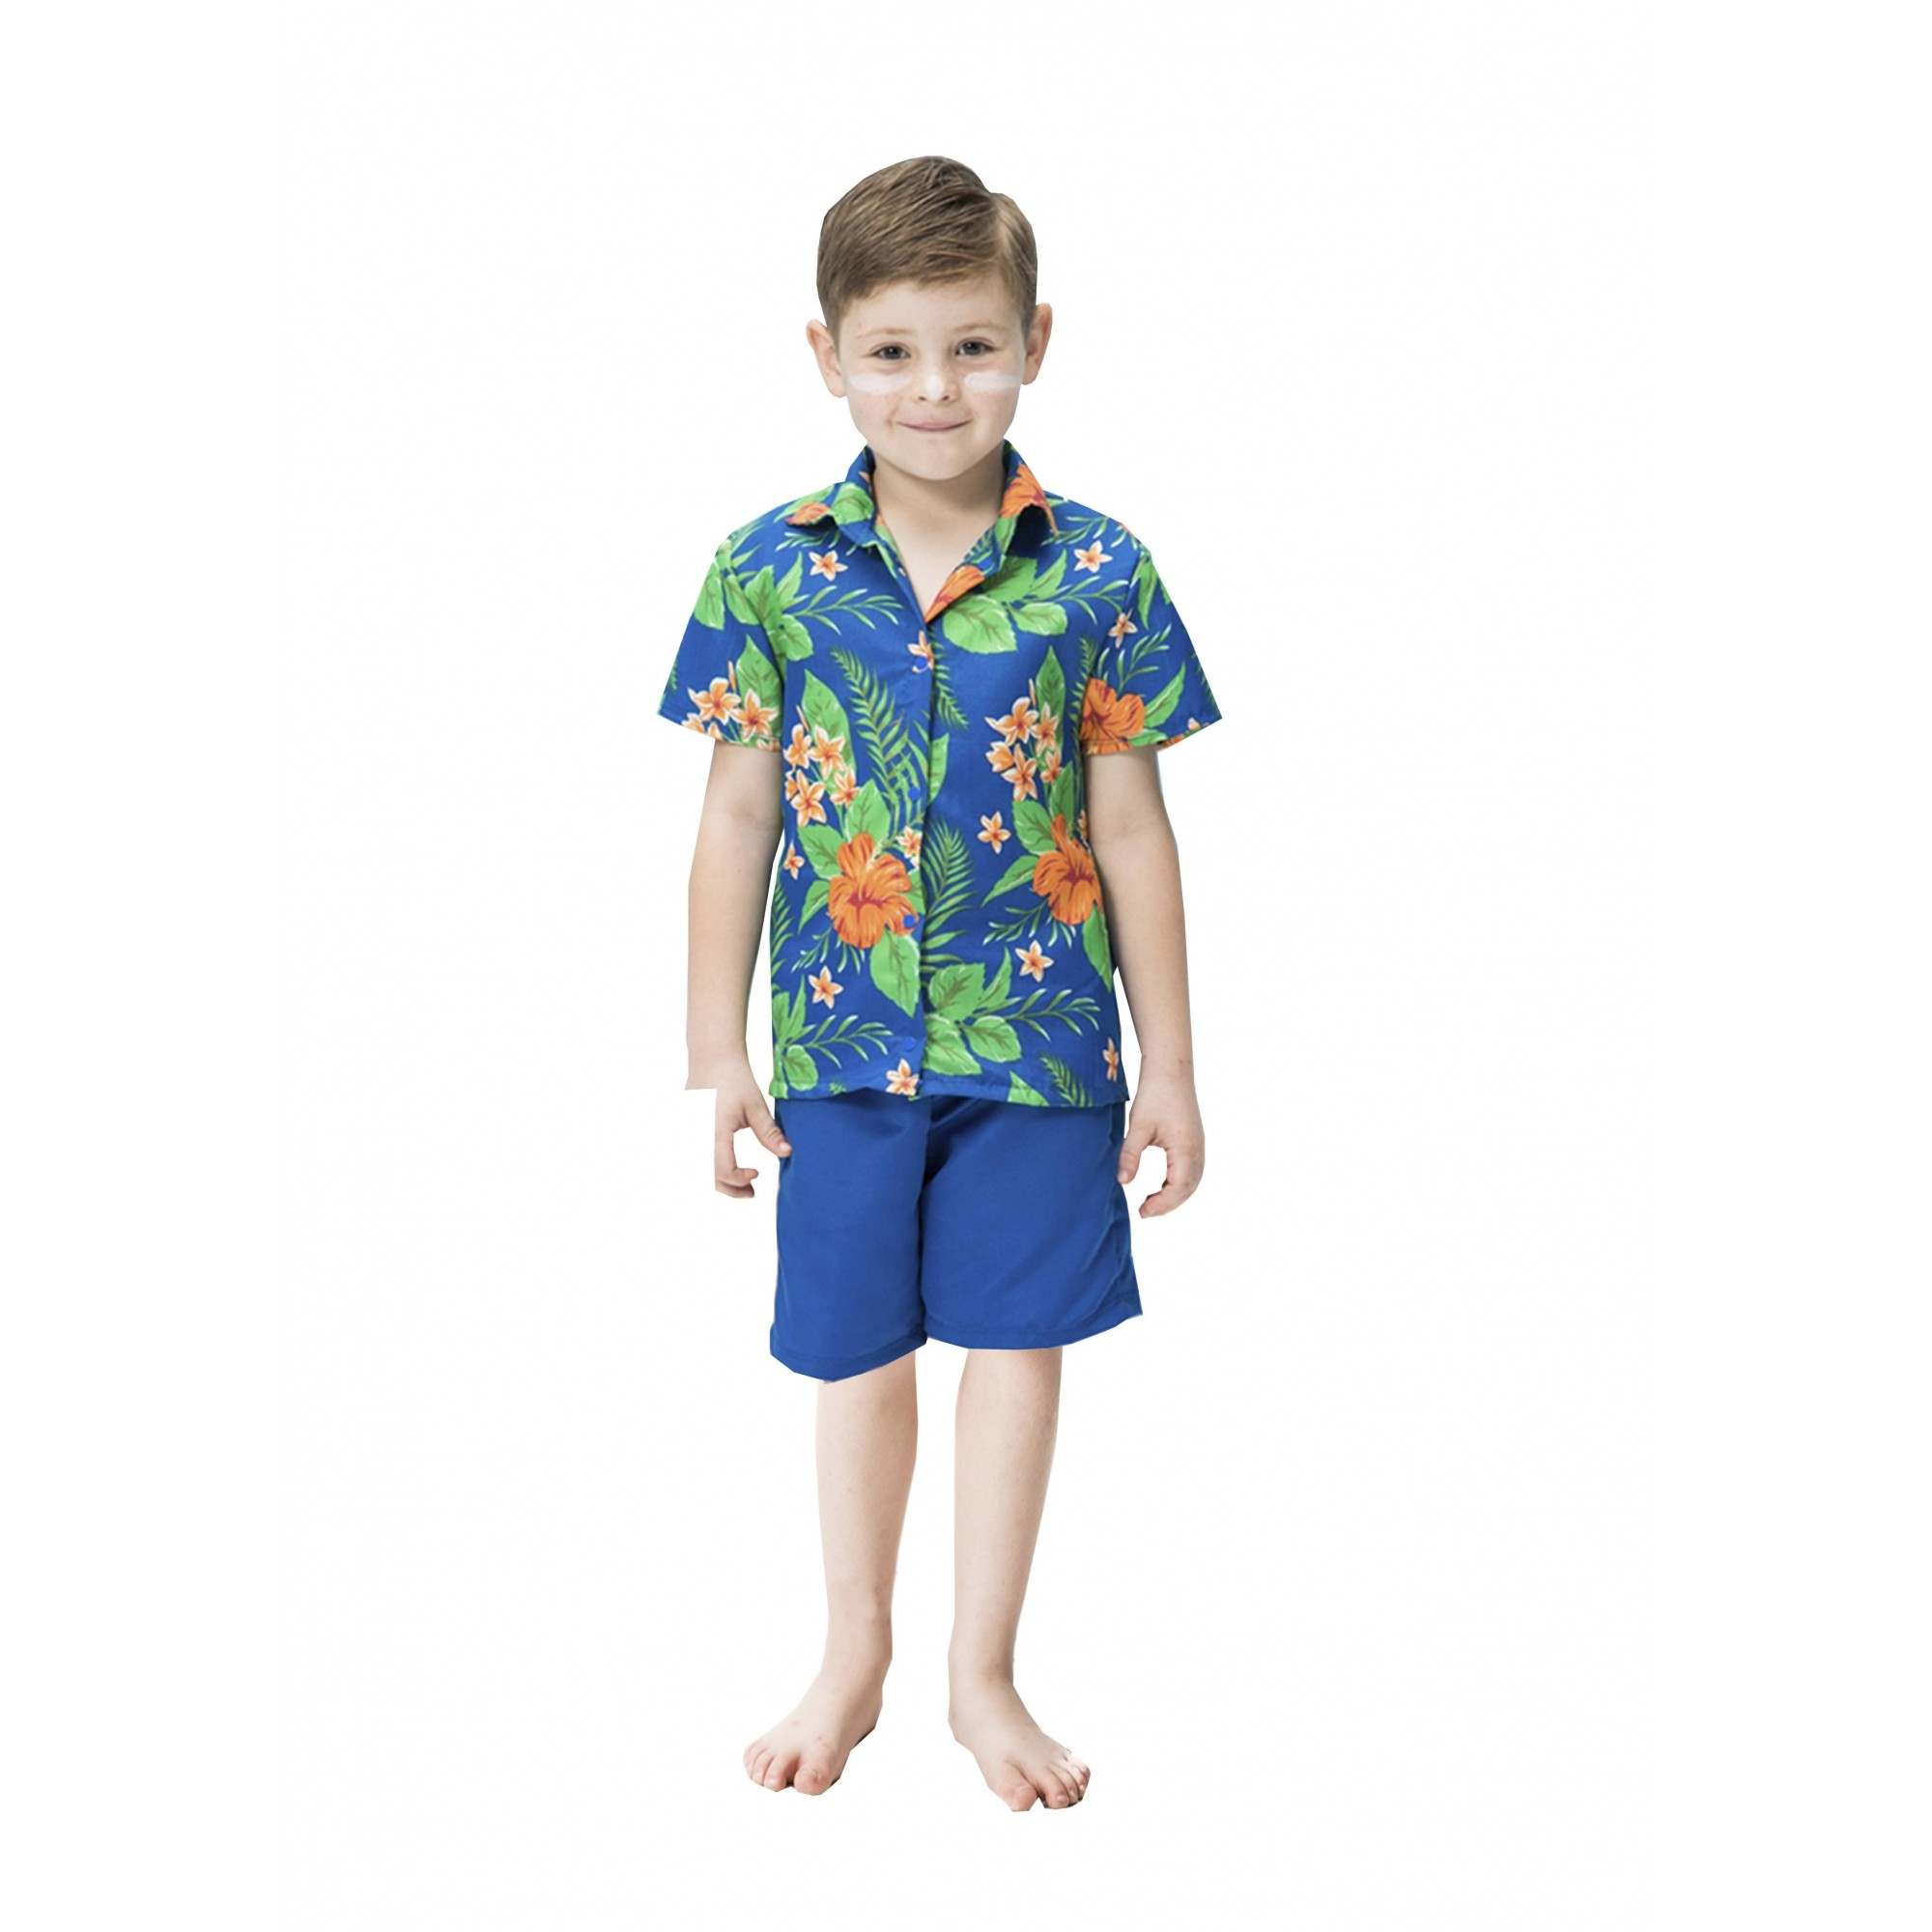 Fantasia de Havaiano Kai infantil camisa e bermuda